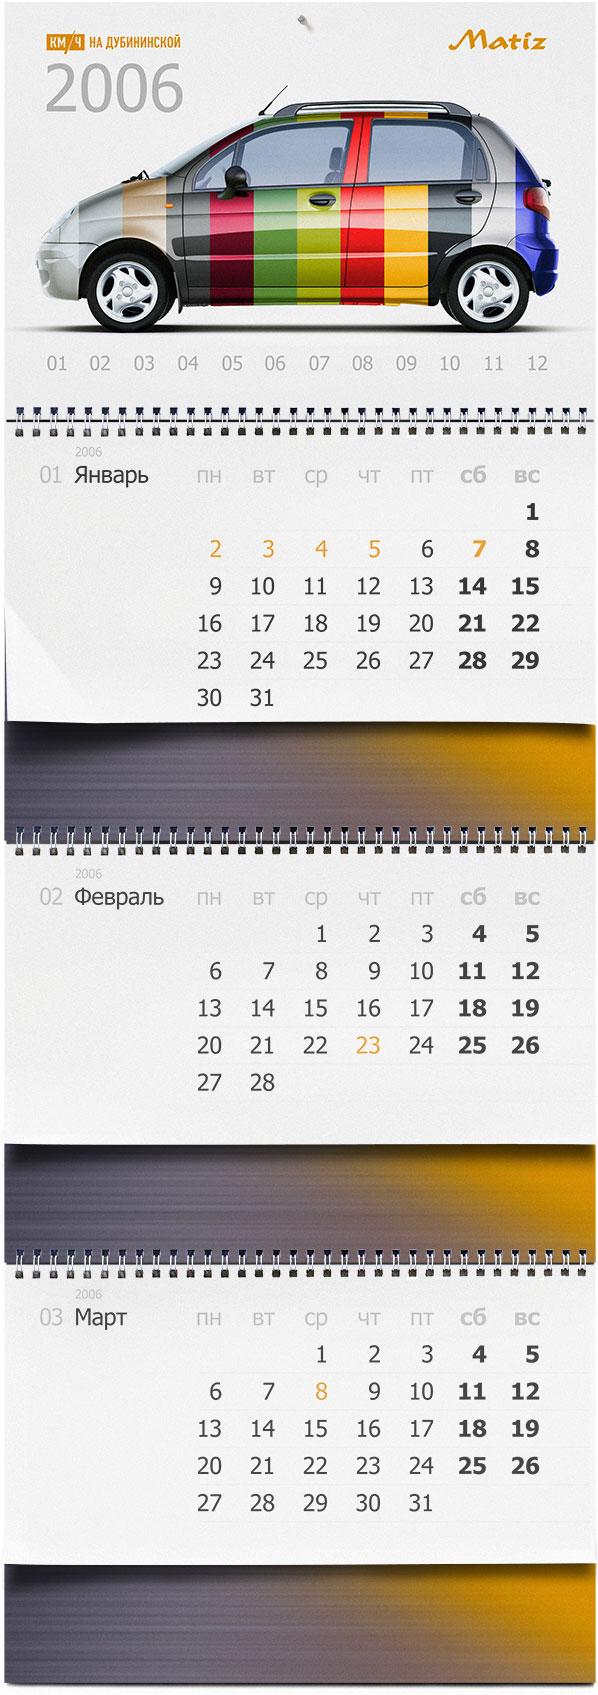 Corporate Calendars Designs